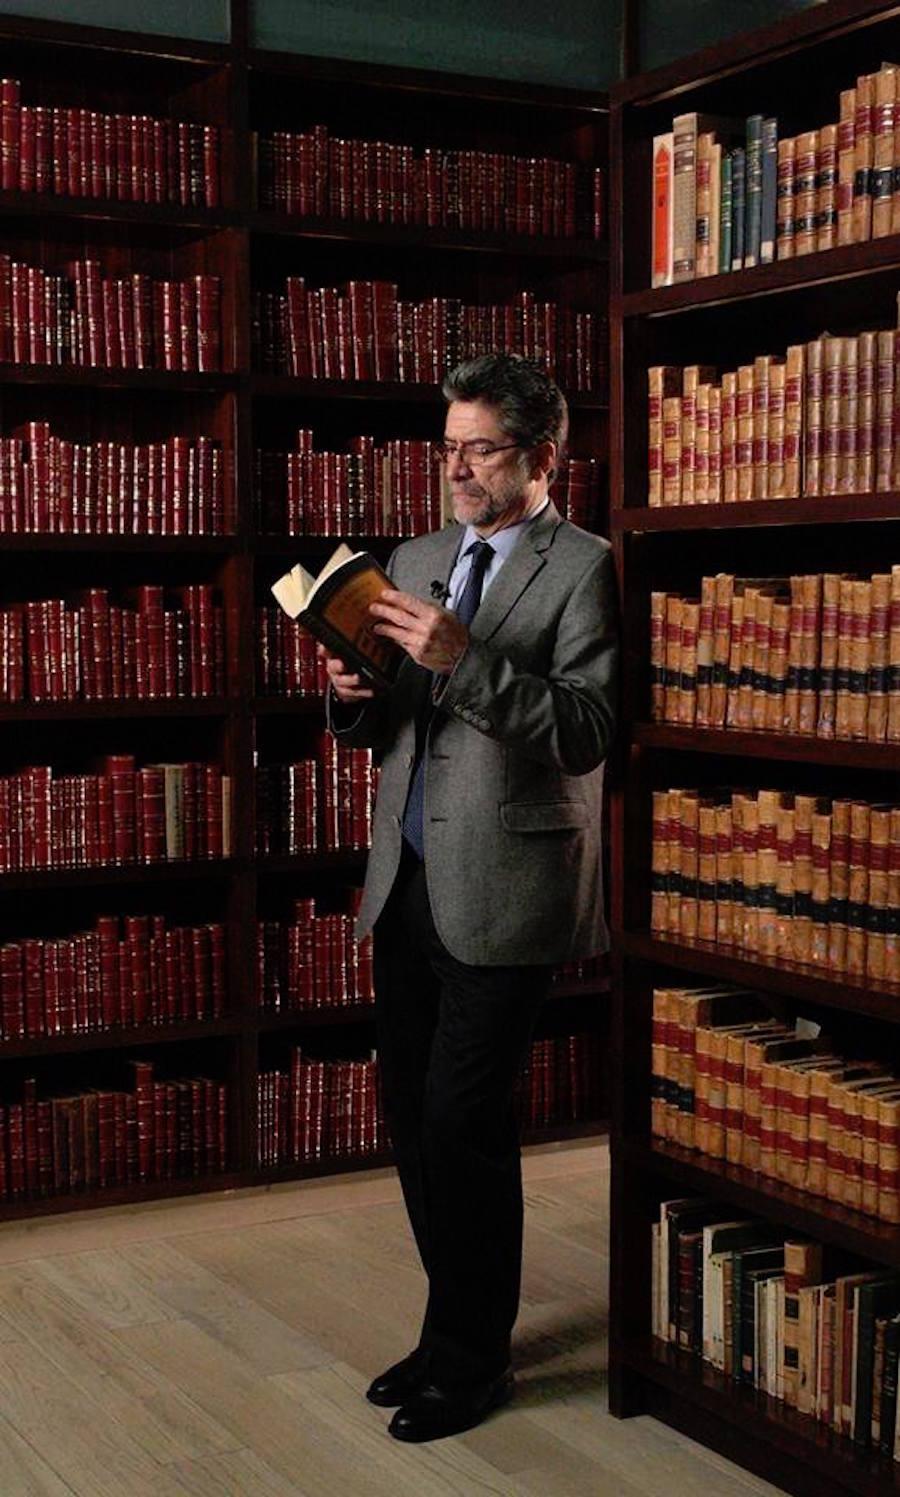 Amenazan de muerte al escritor Rafael Pérez Gay